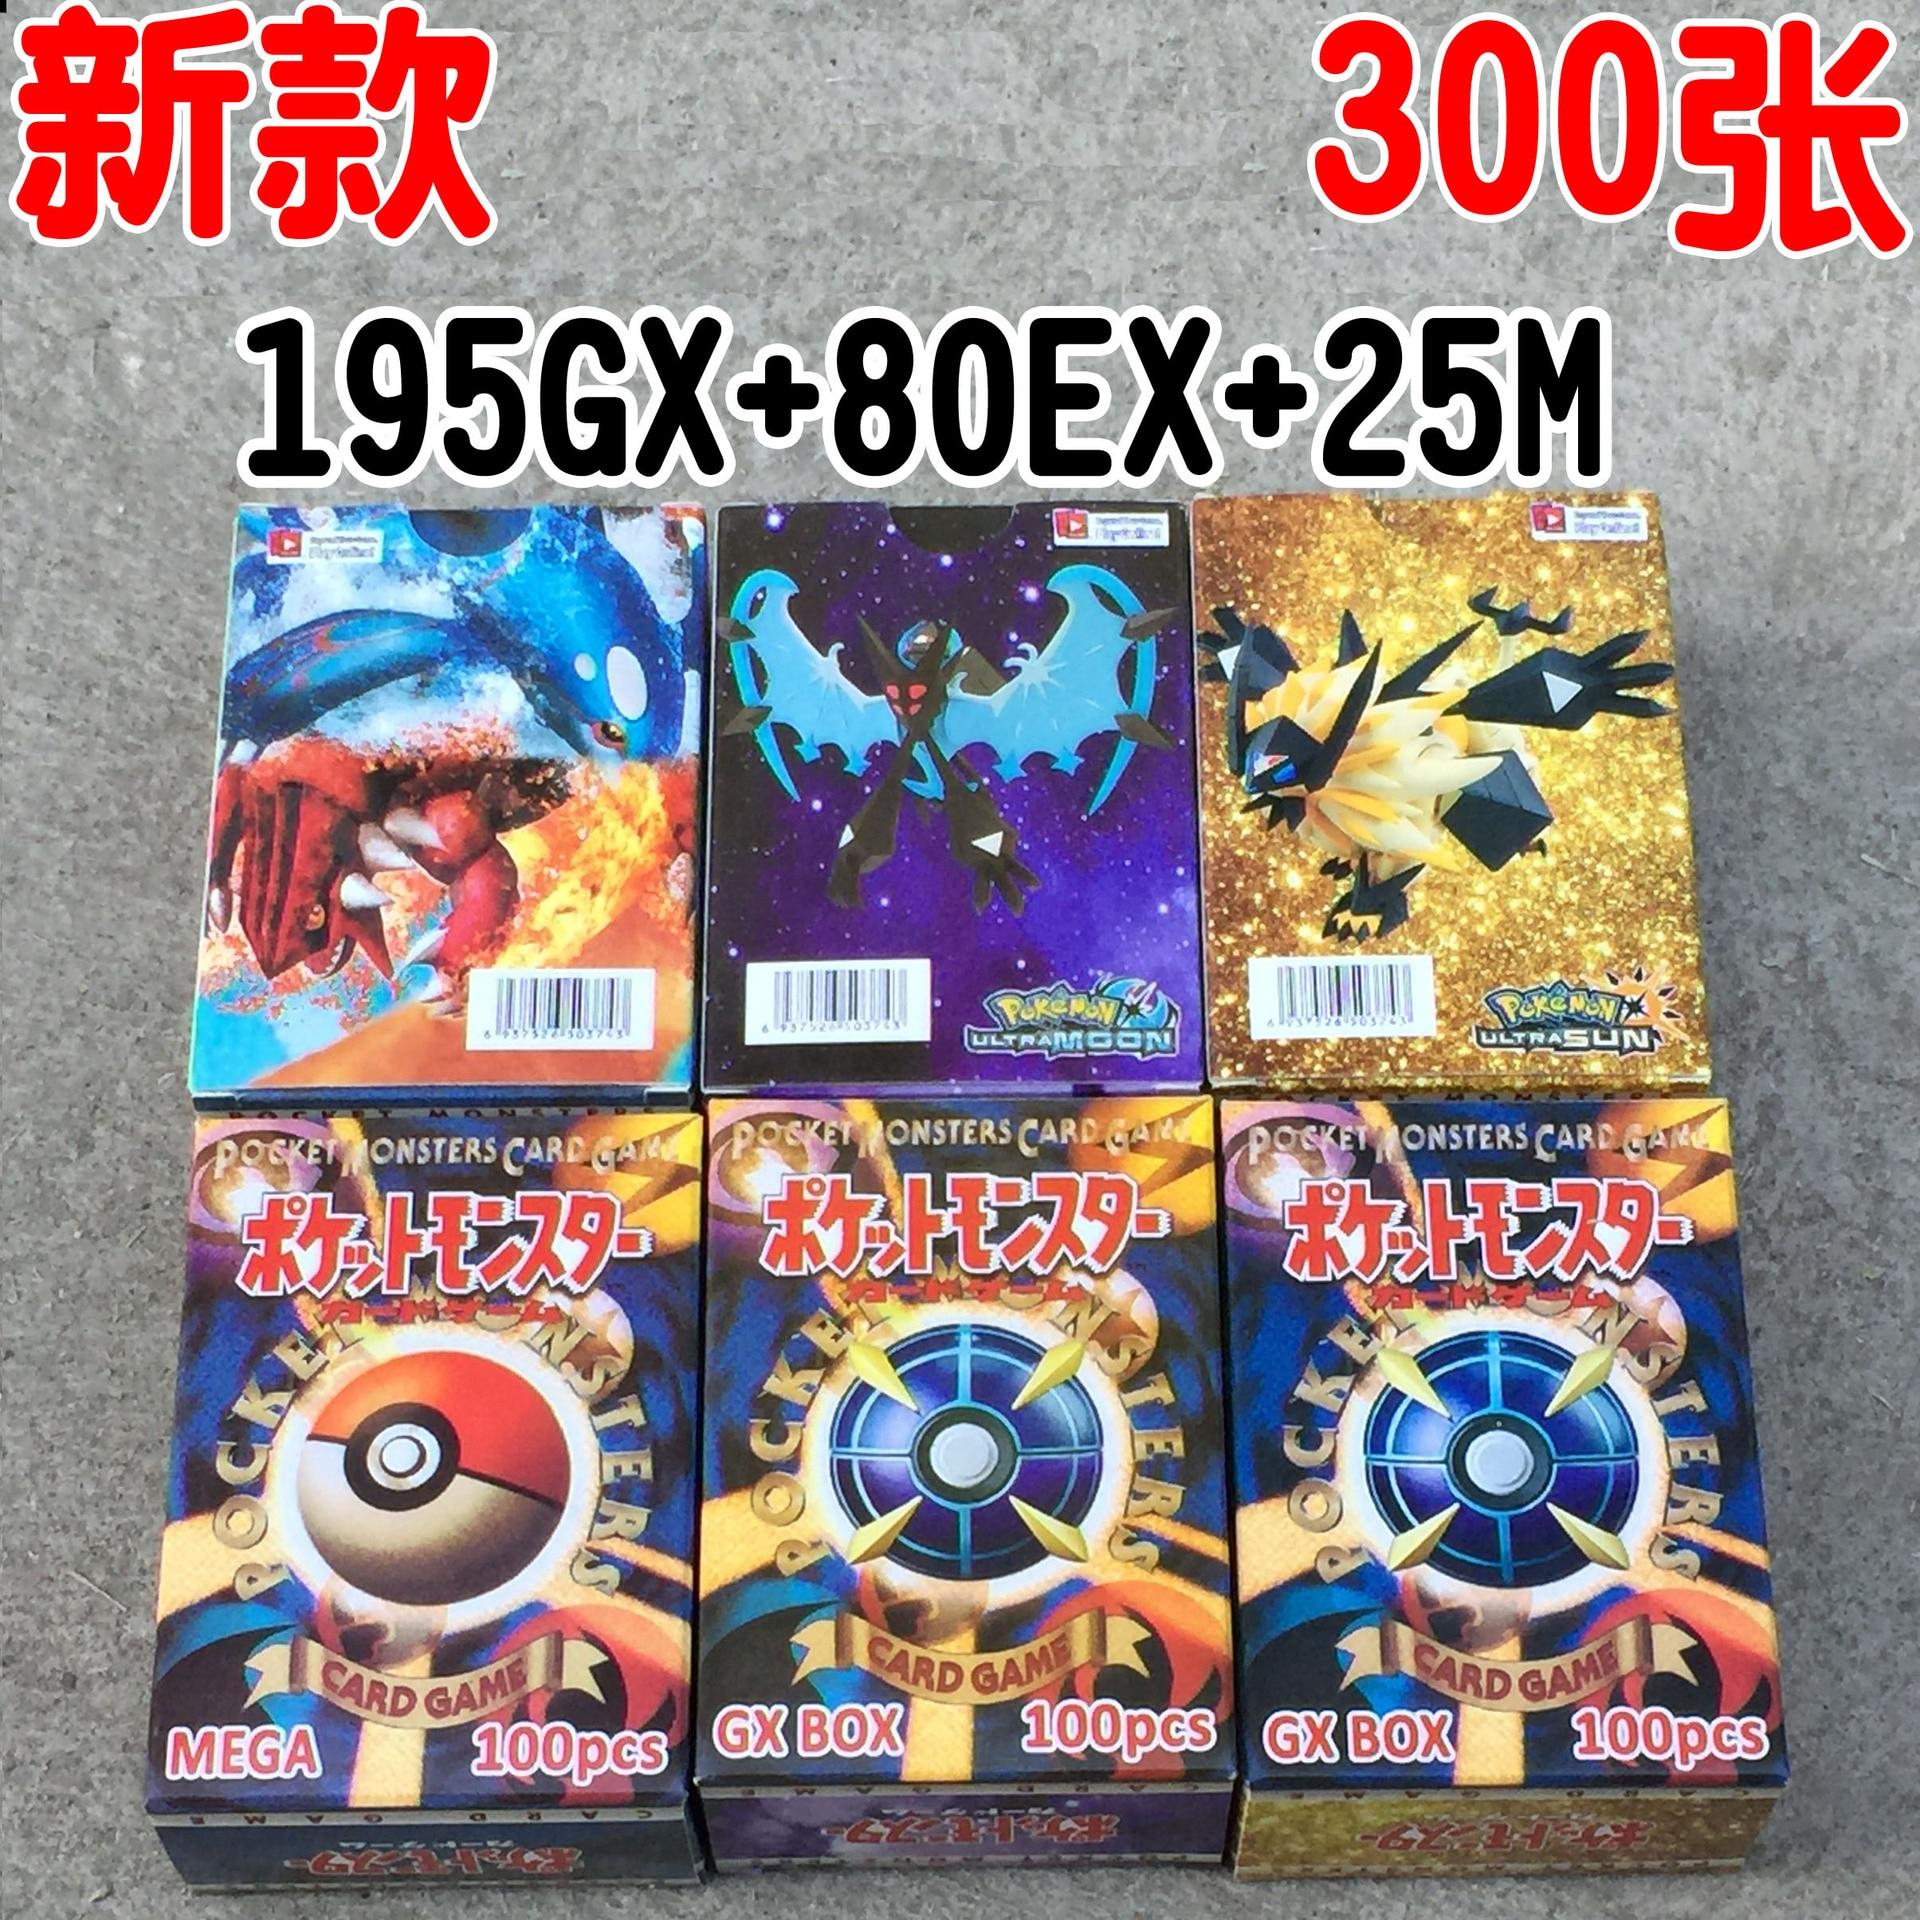 300 Pcs Pokemon Flash Cards  Original 1996 Years Charizard Blastoise Venusaur Mewtwo  Toys Of  Childrens